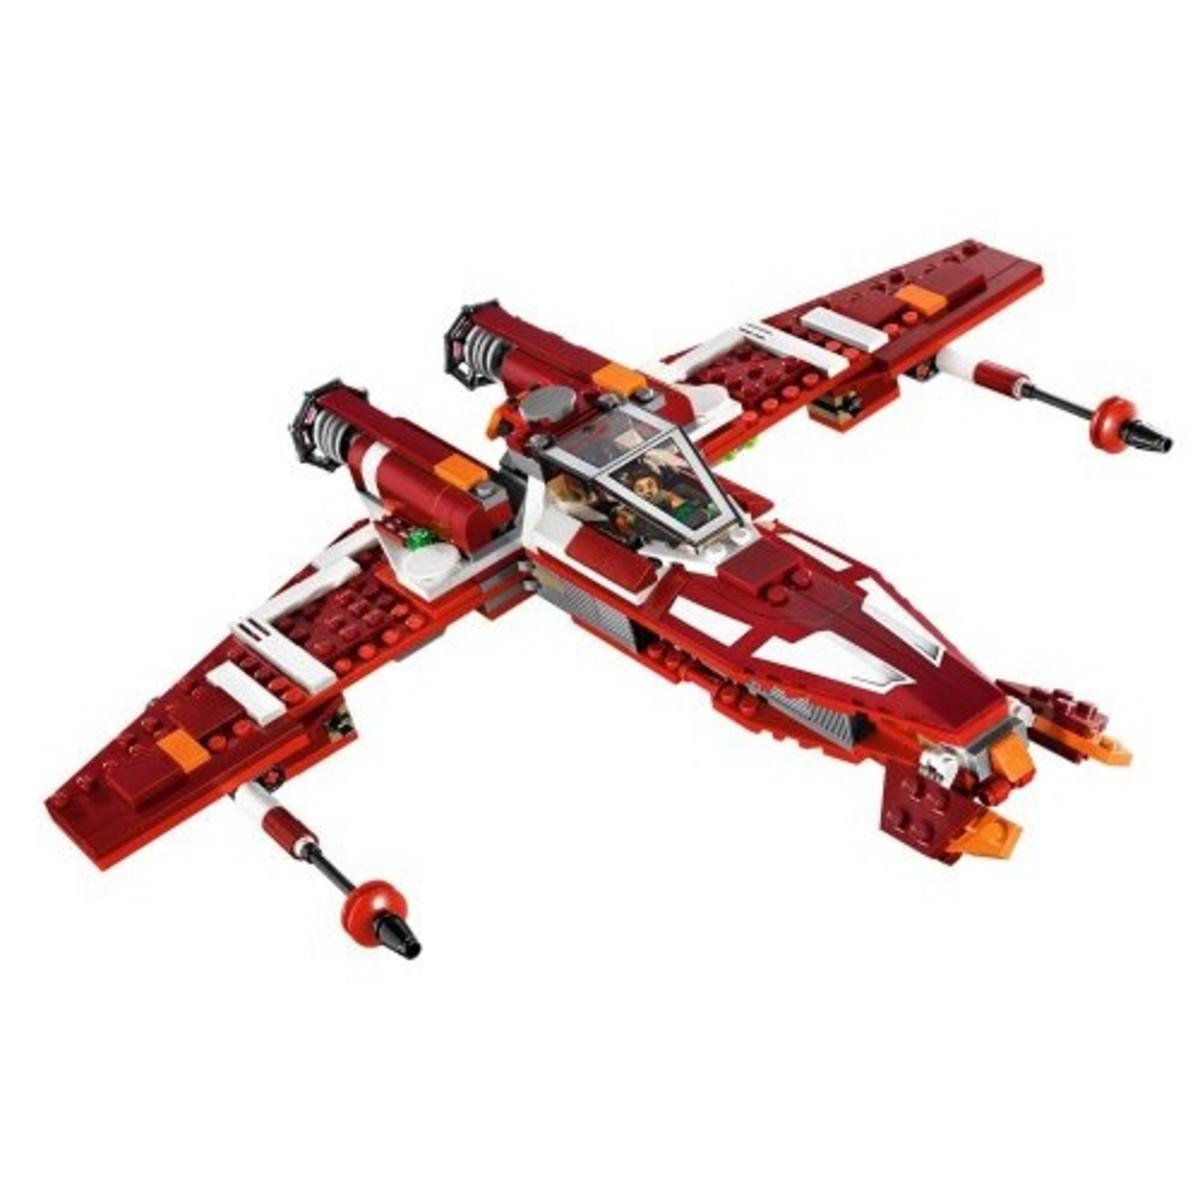 LEGO Star Wars Republic Striker Starfighter 9497 Assembled